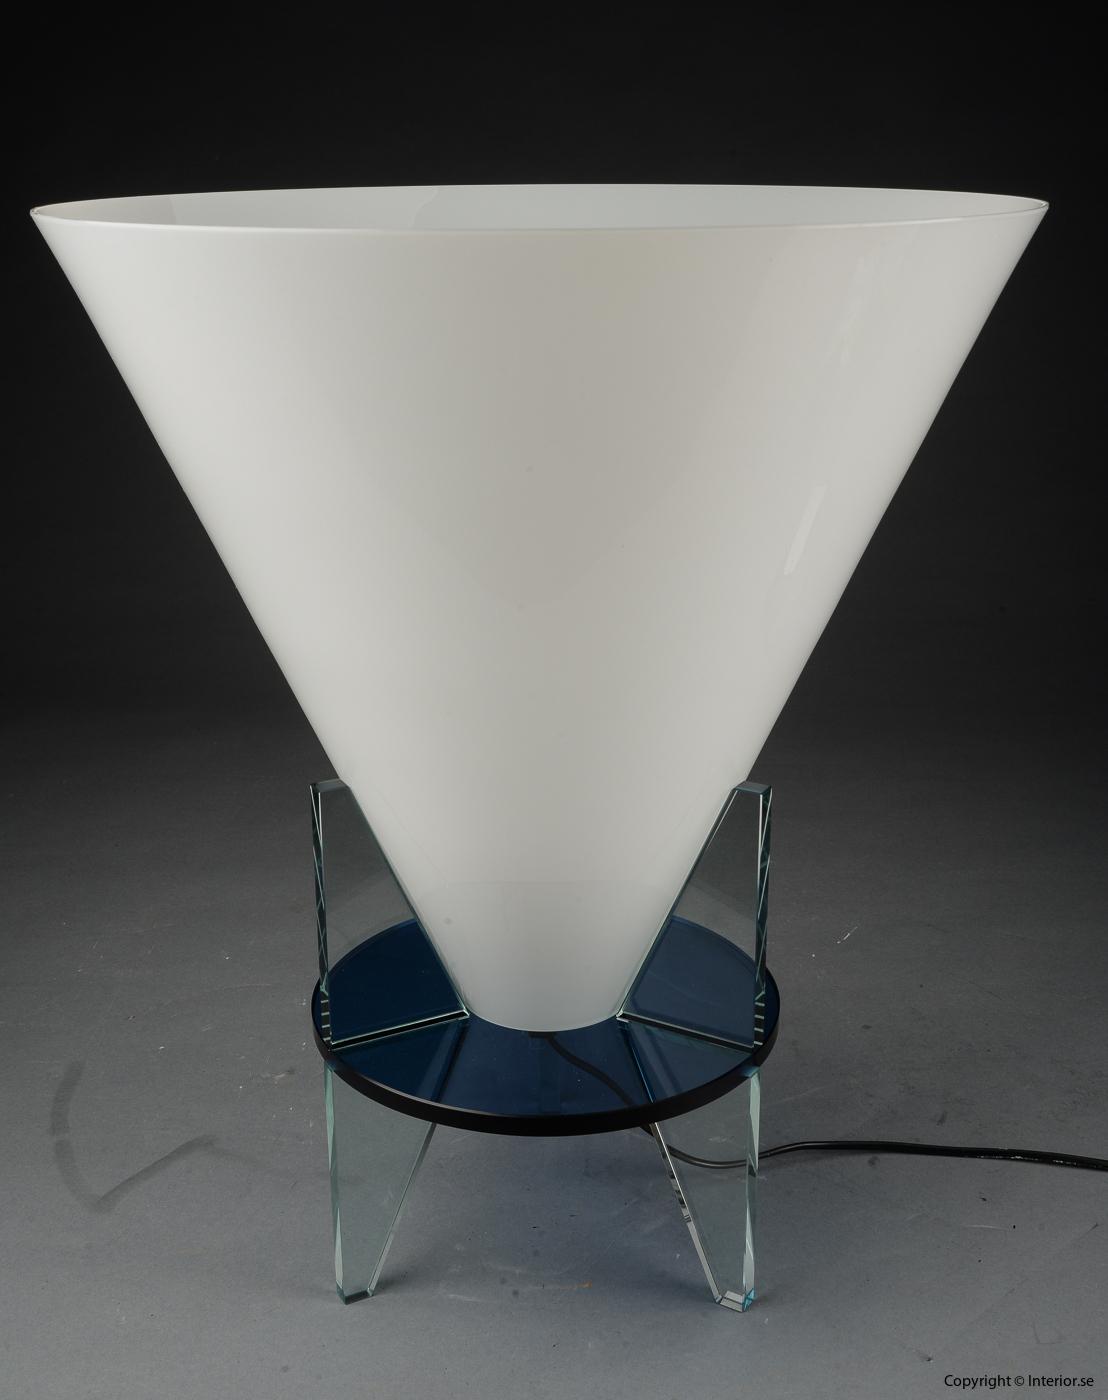 Bordslampa table lamp tischlampen Fontana Arte Otero - Design Rodolfo Dordoni 2